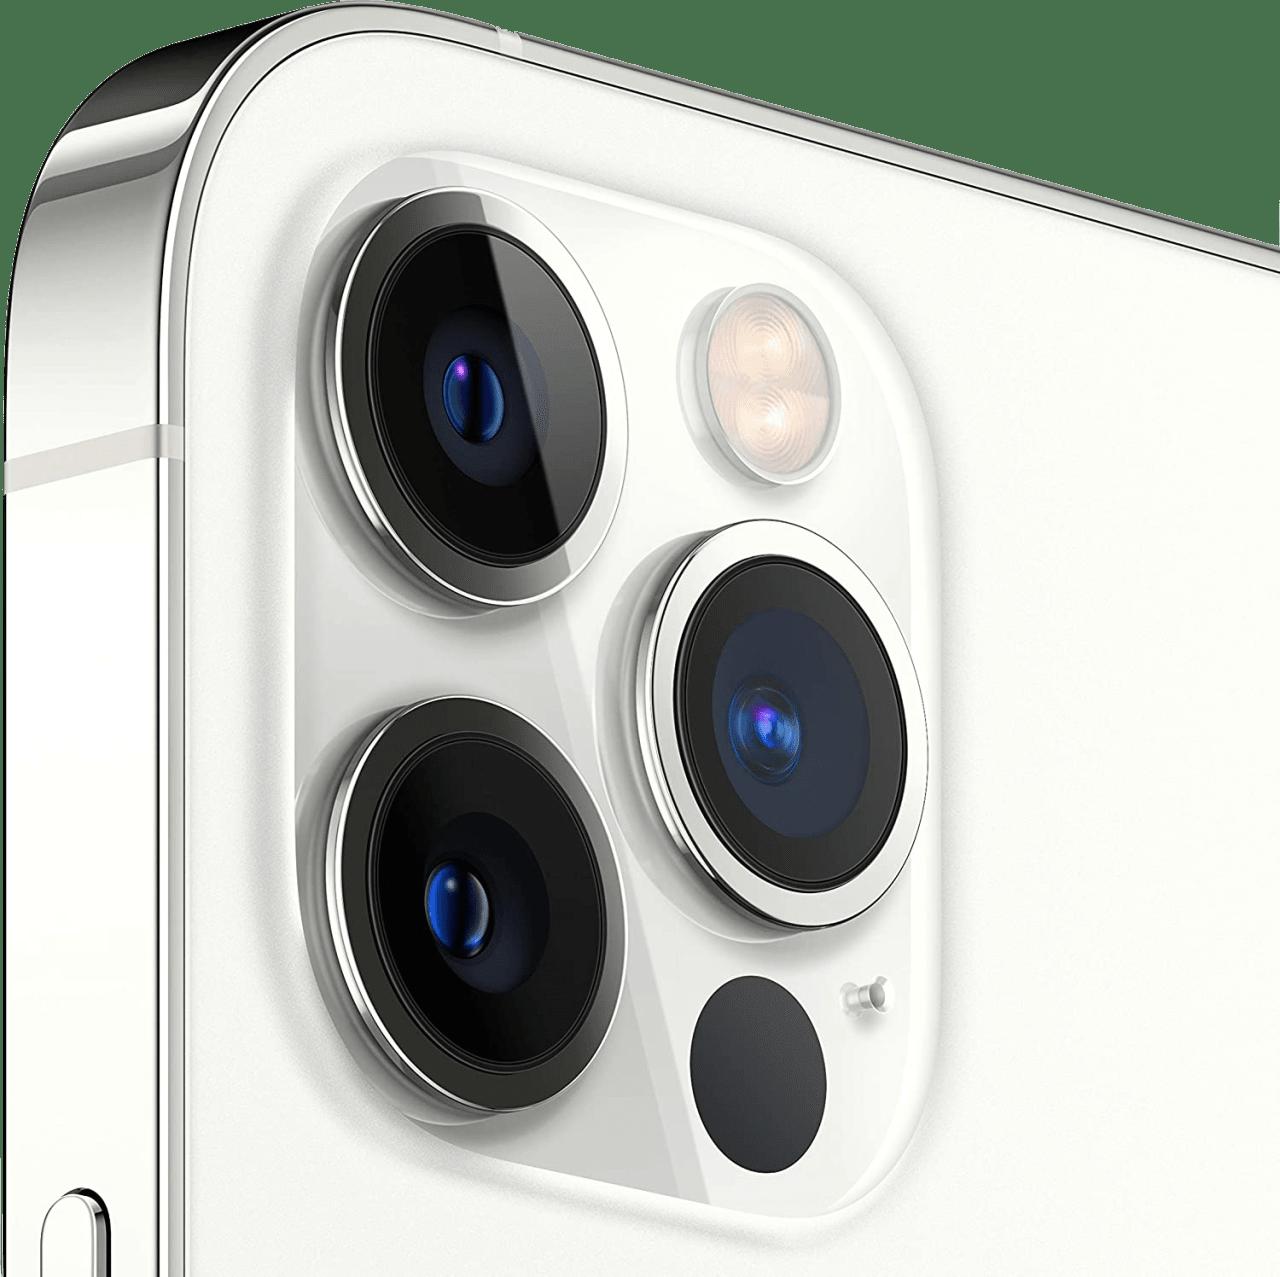 Silber Apple iPhone 12 Pro 128GB.4